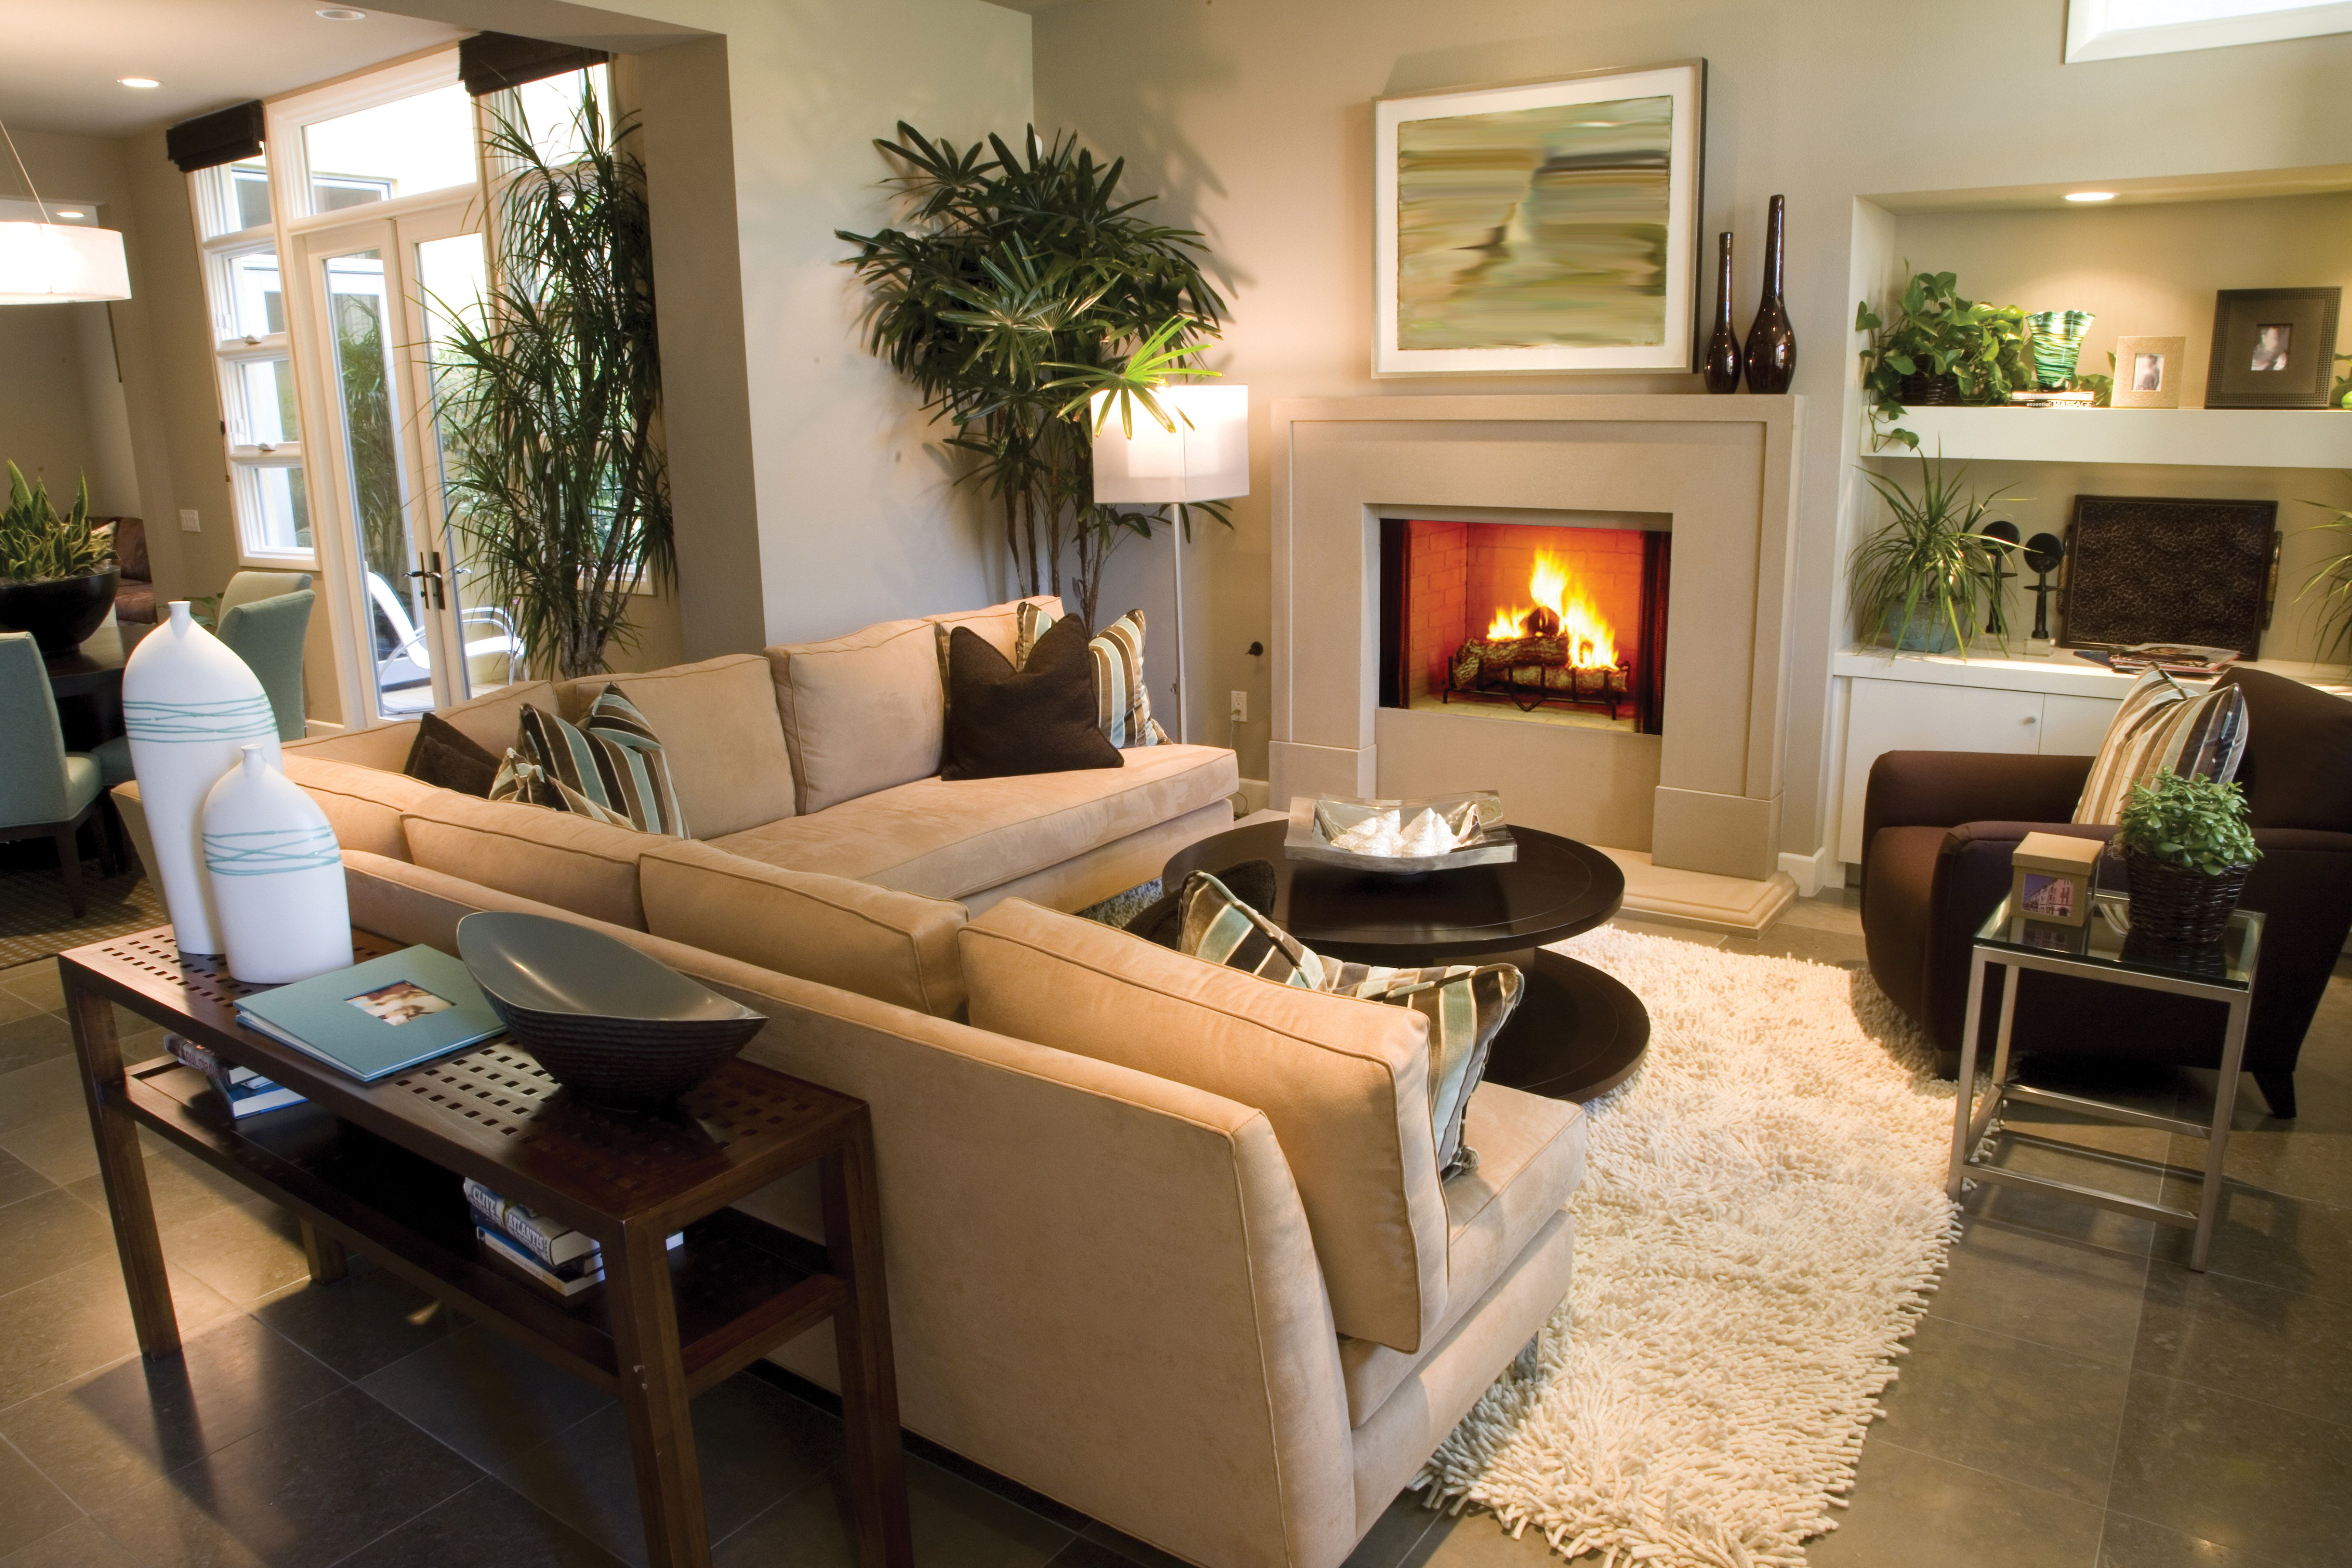 Wood Fireplaces:  Energy Center-Manhattan Pool 528 Pillsbury Drive Manhattan, KS 66502 800-287-5118 785-776-5118 www.energycentermanhattanpool.com